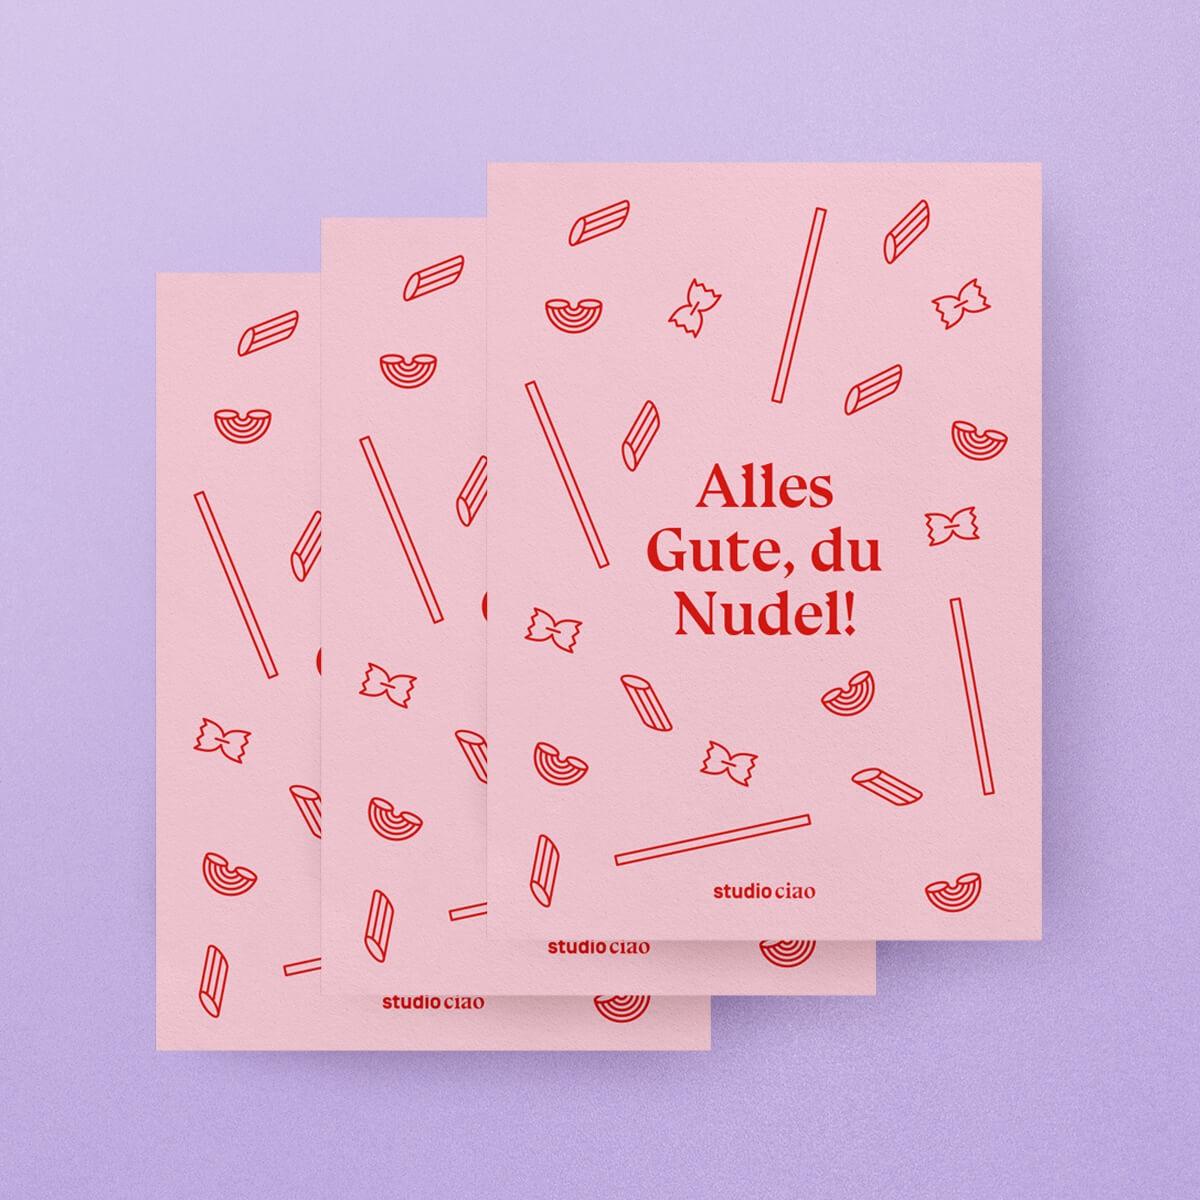 Alles Gute, du Nudel! / 3er Postkartenset – studio ciao